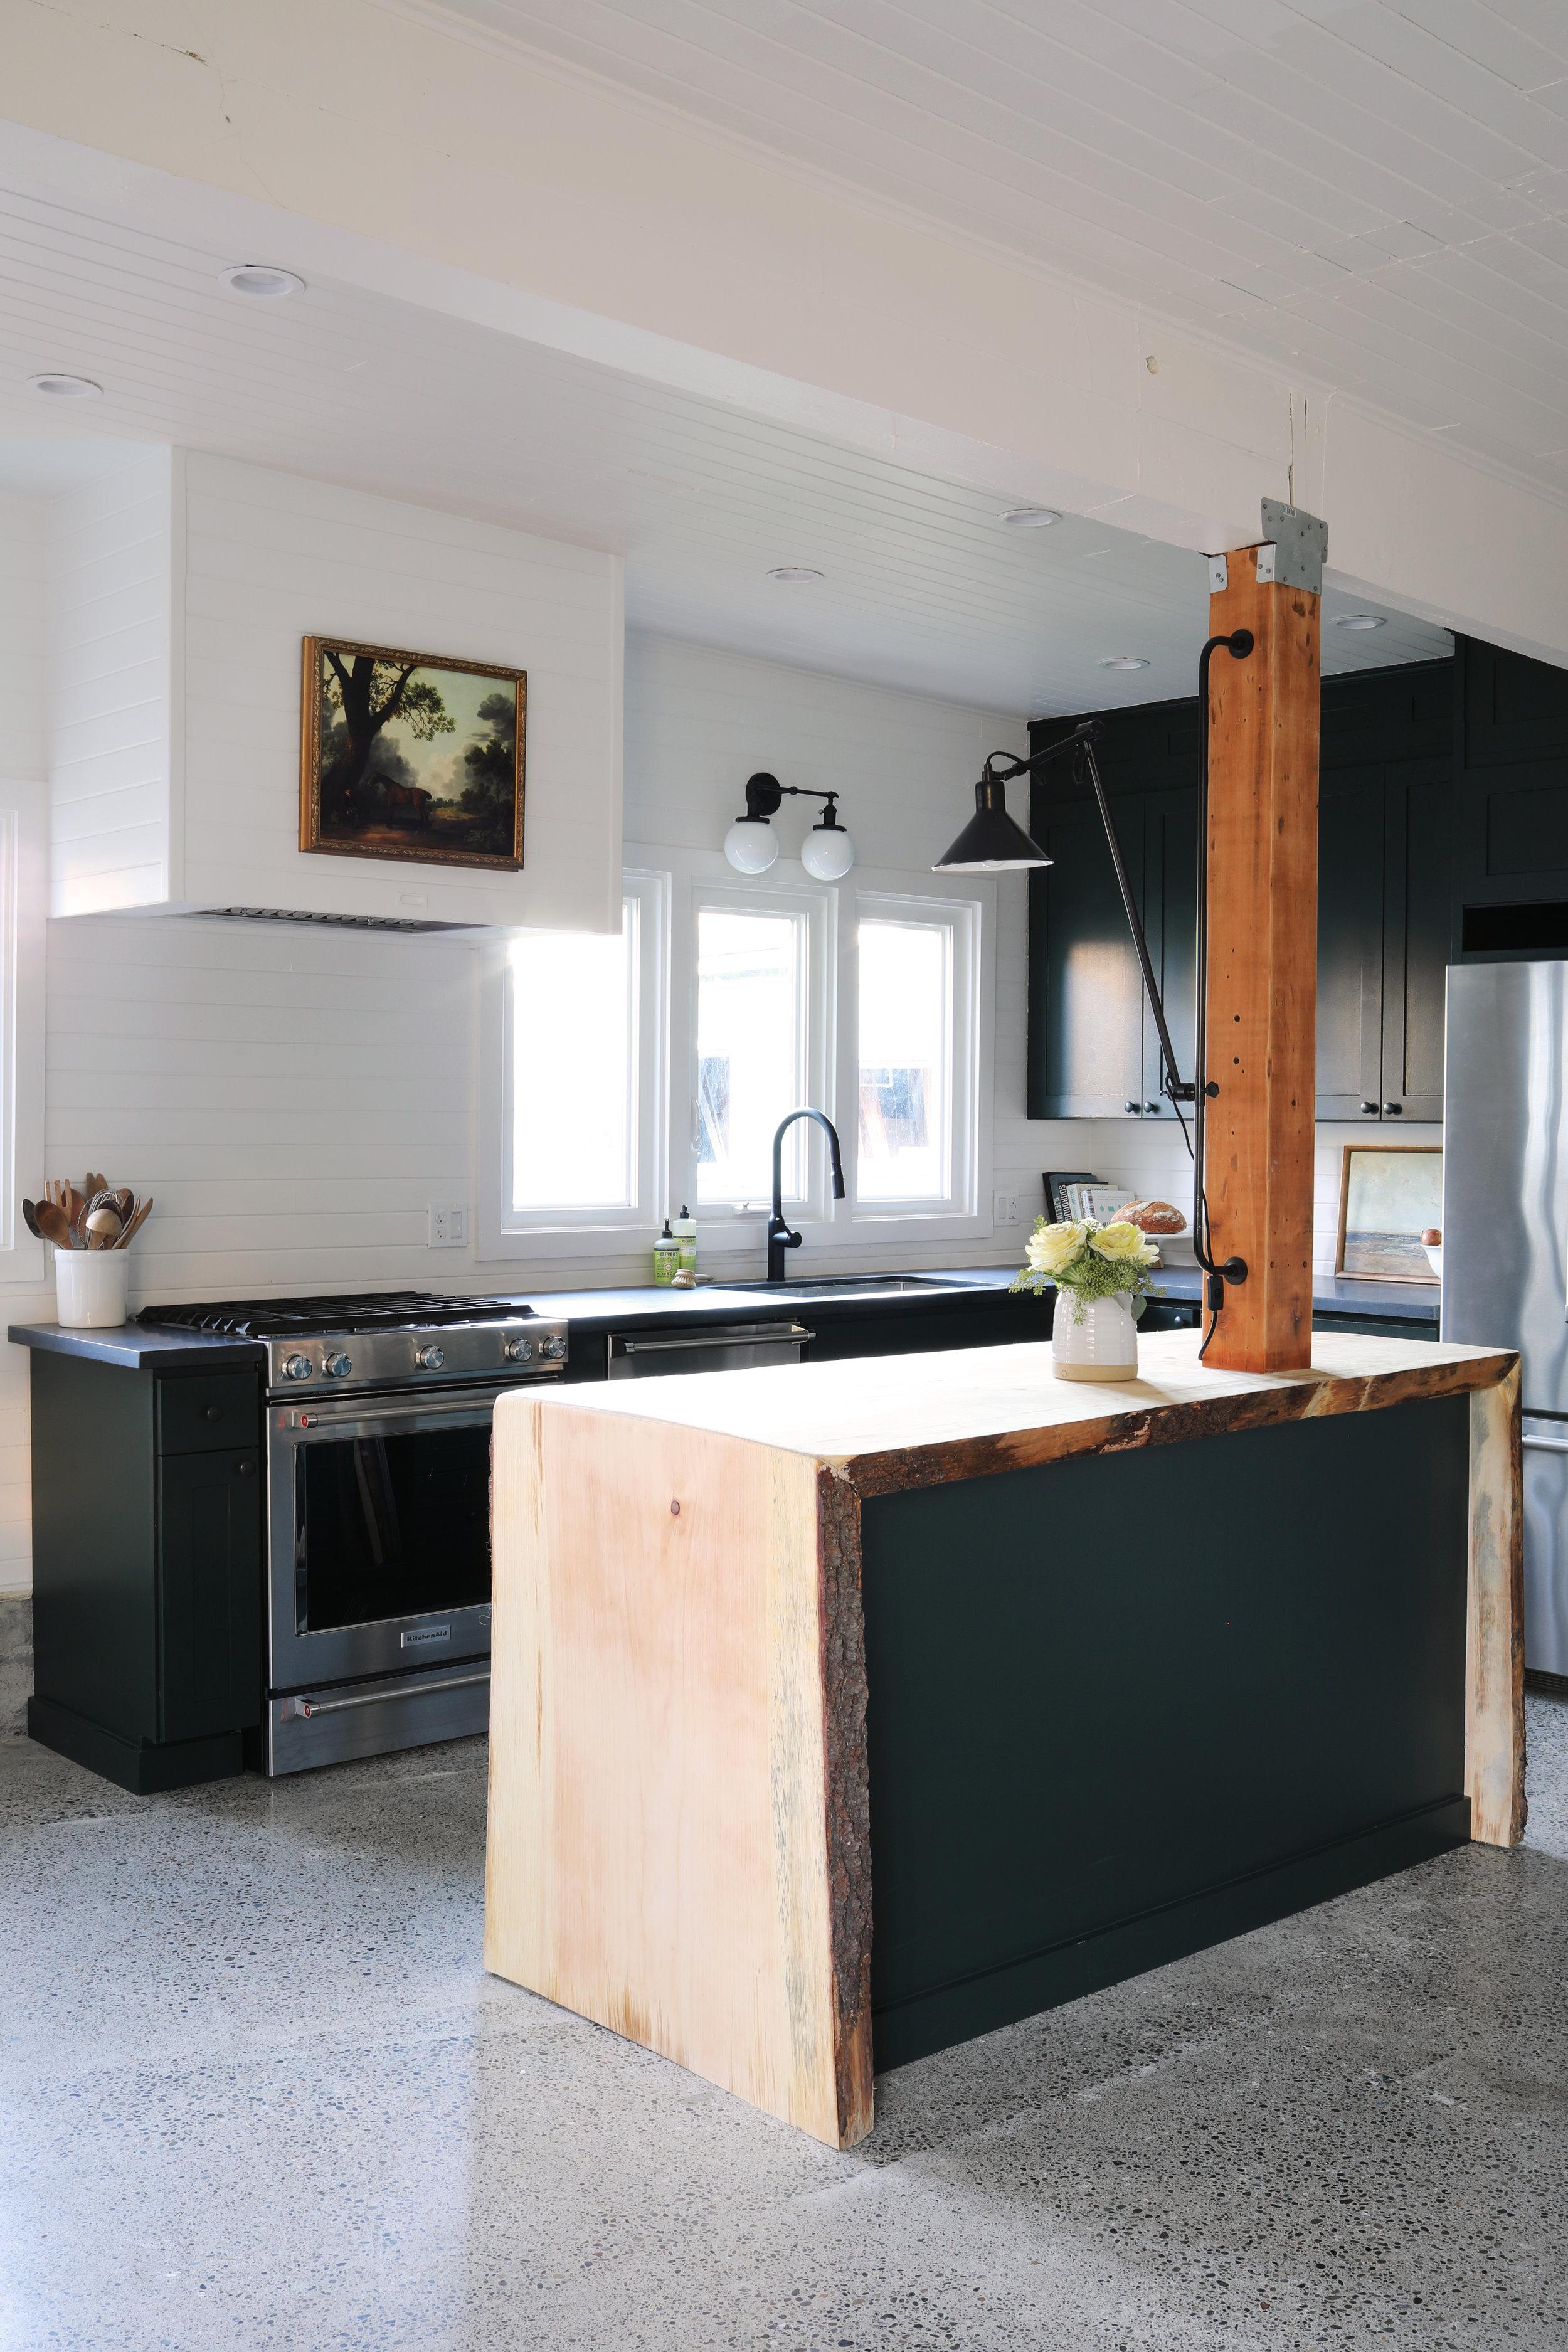 The Grit and Polish - Tacoma Kitchen Reveal Waterfall Live Edge Island Back.jpg